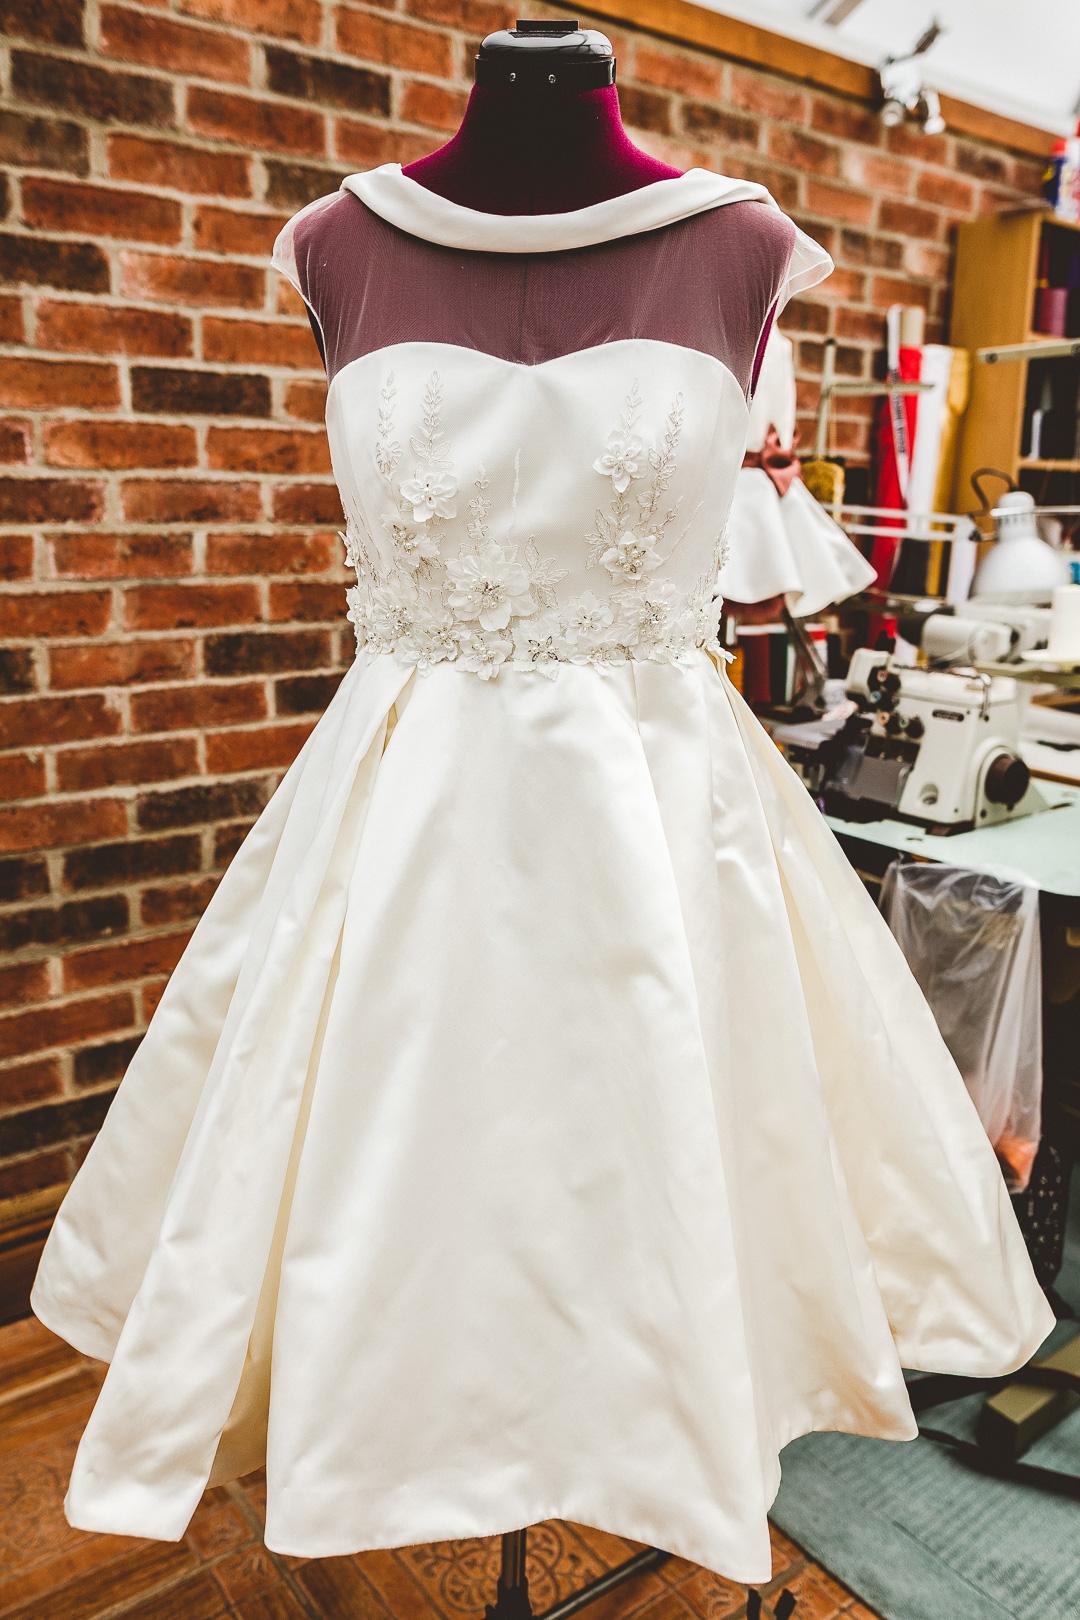 50's-style-bespoke-wedding-dress-tea-length-festival-style-wedding